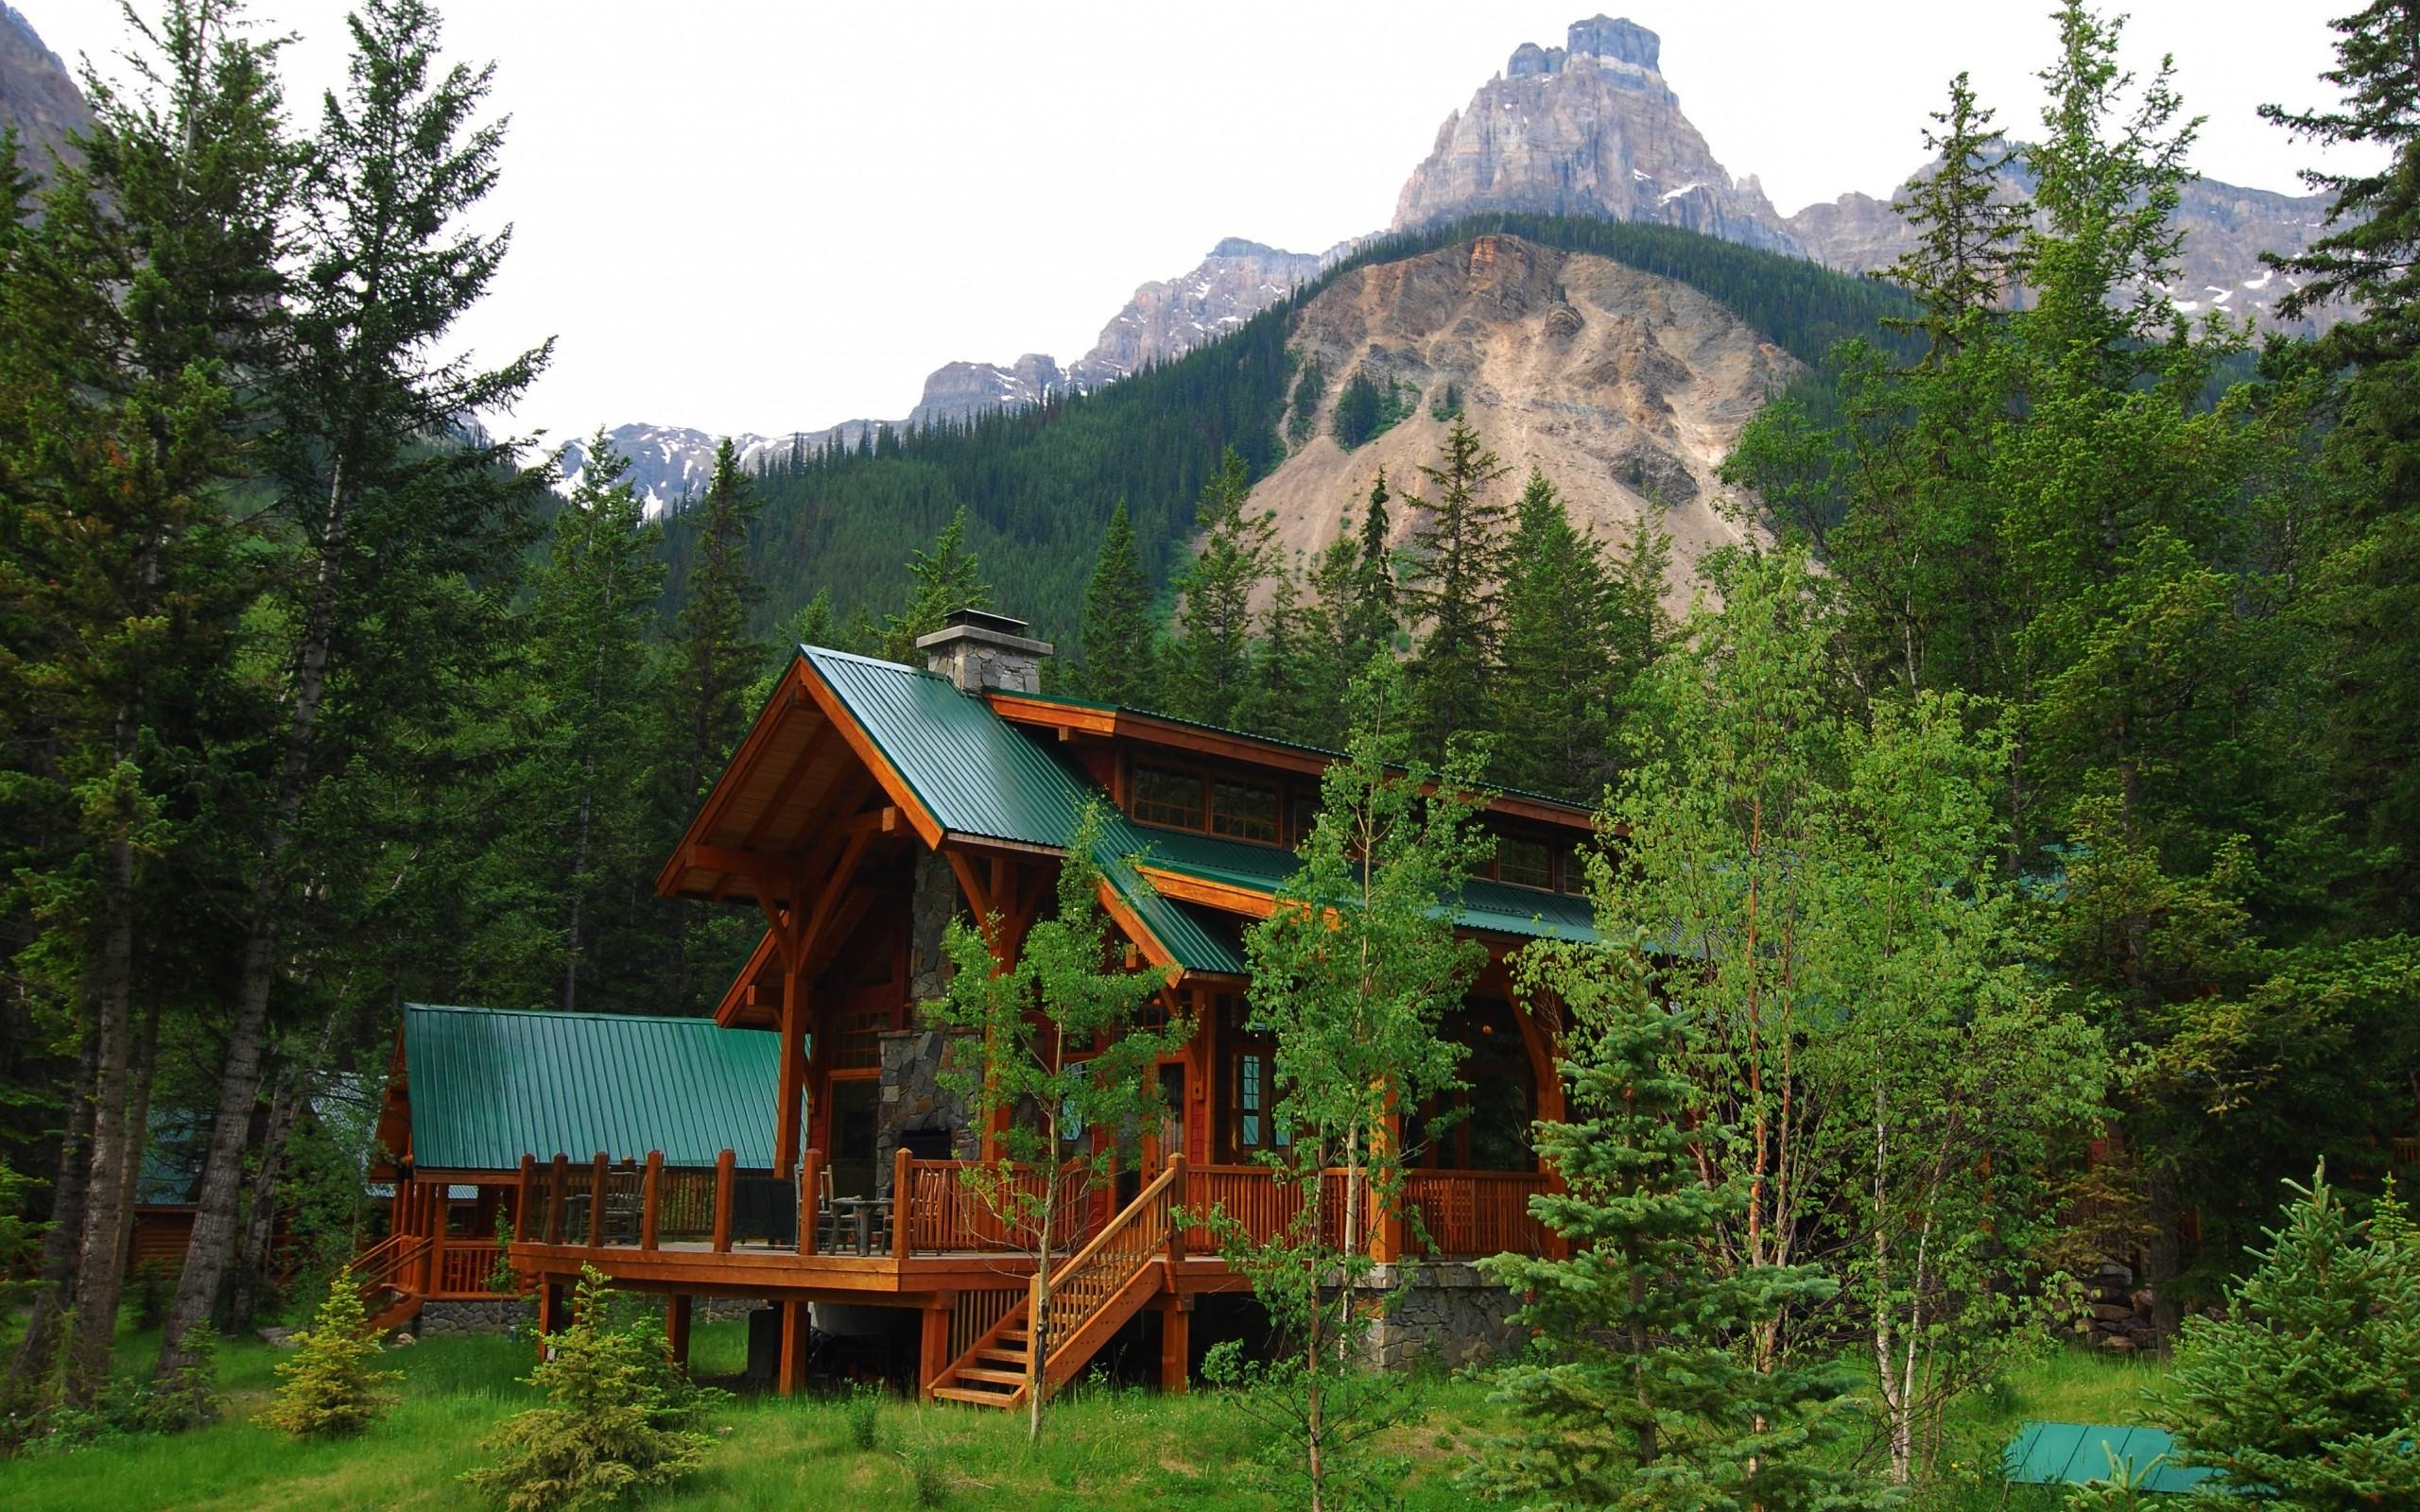 Mountain cabin wallpaper 2560x1600